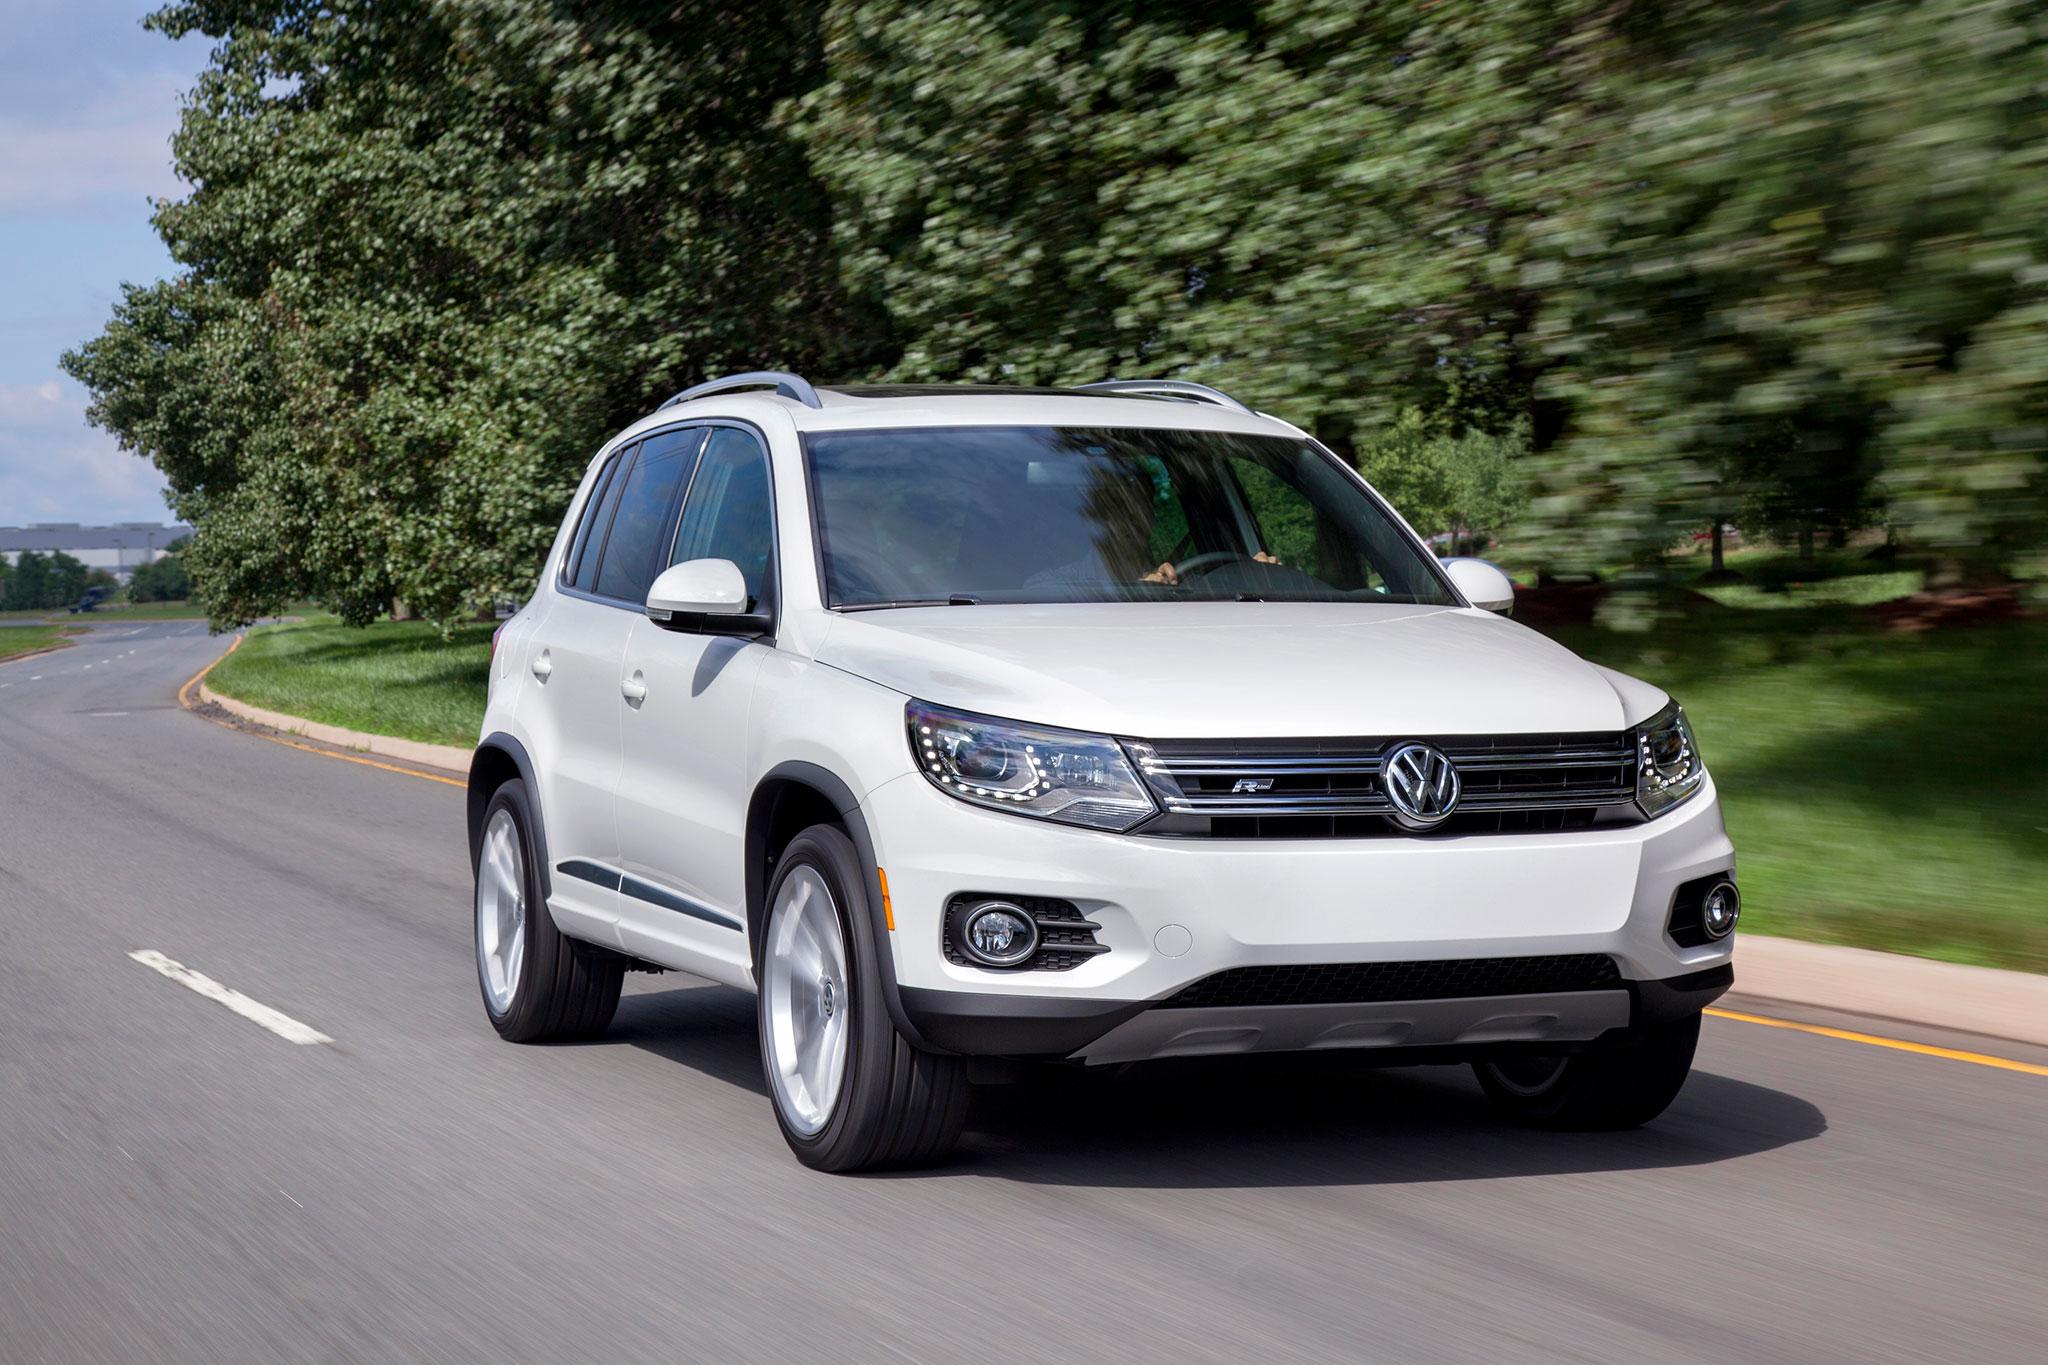 2014 Volkswagen Tiguan R Line Front View In Motion 11